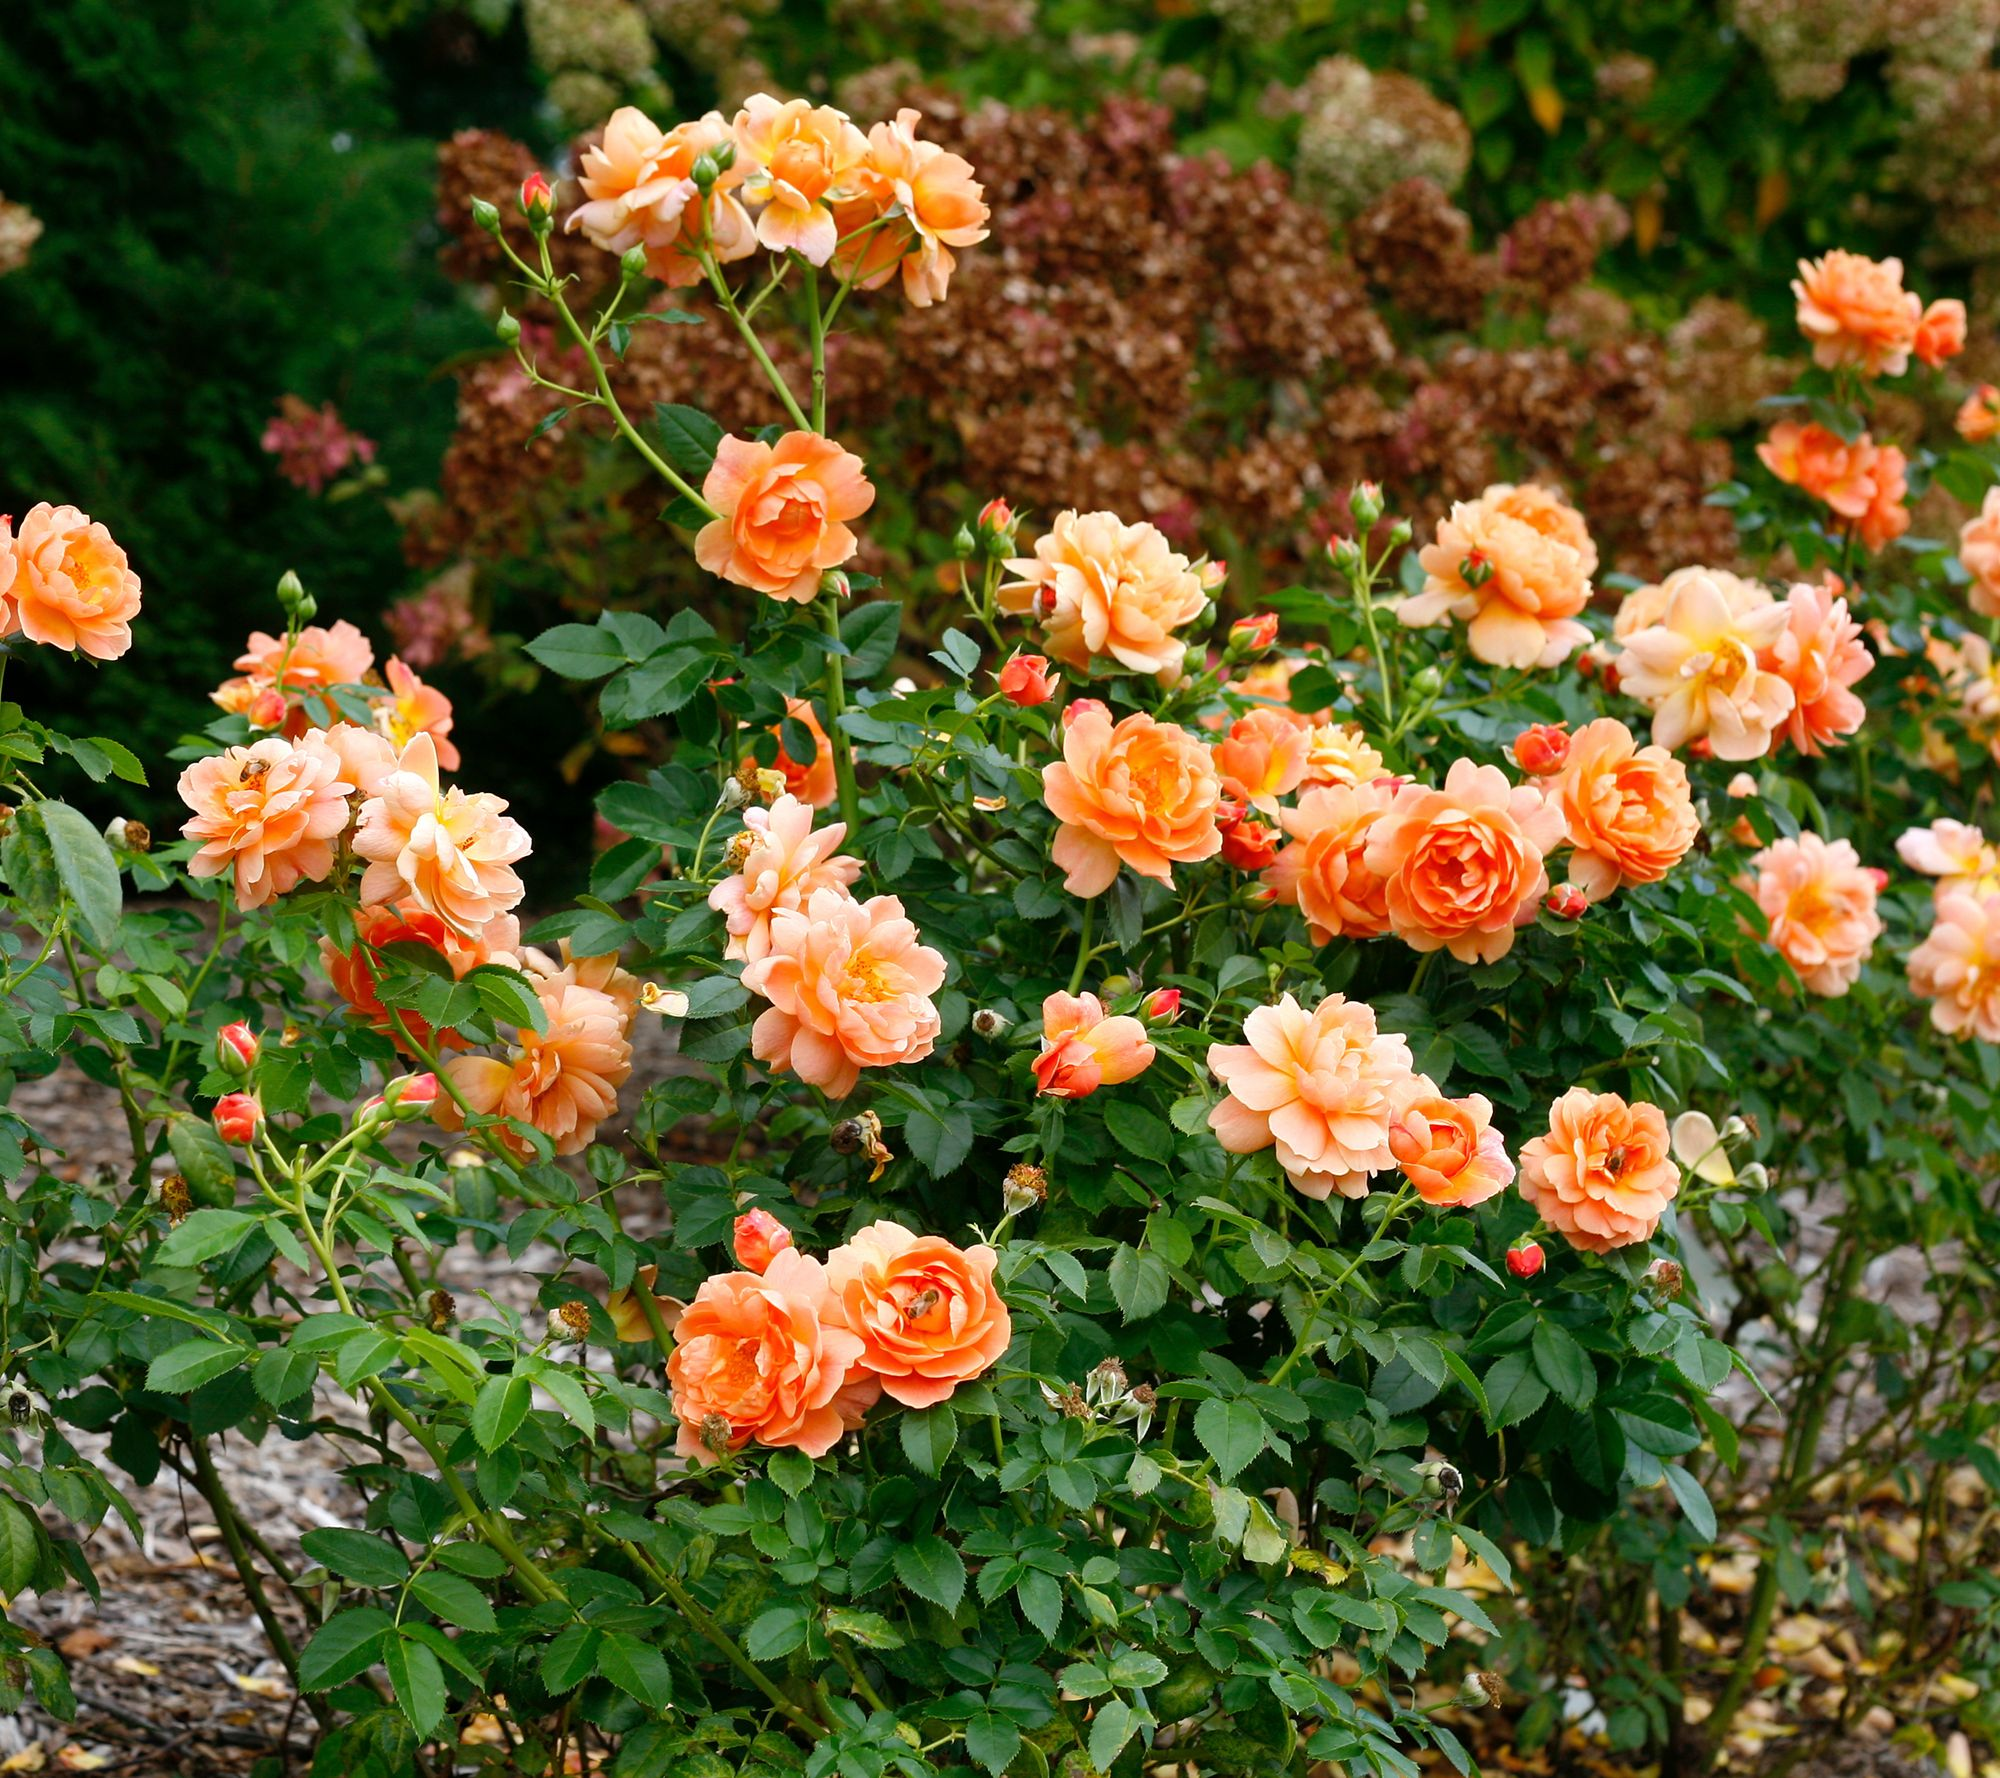 Roberta S 1 Piece Proven Winners At Last Rose Qvc Com